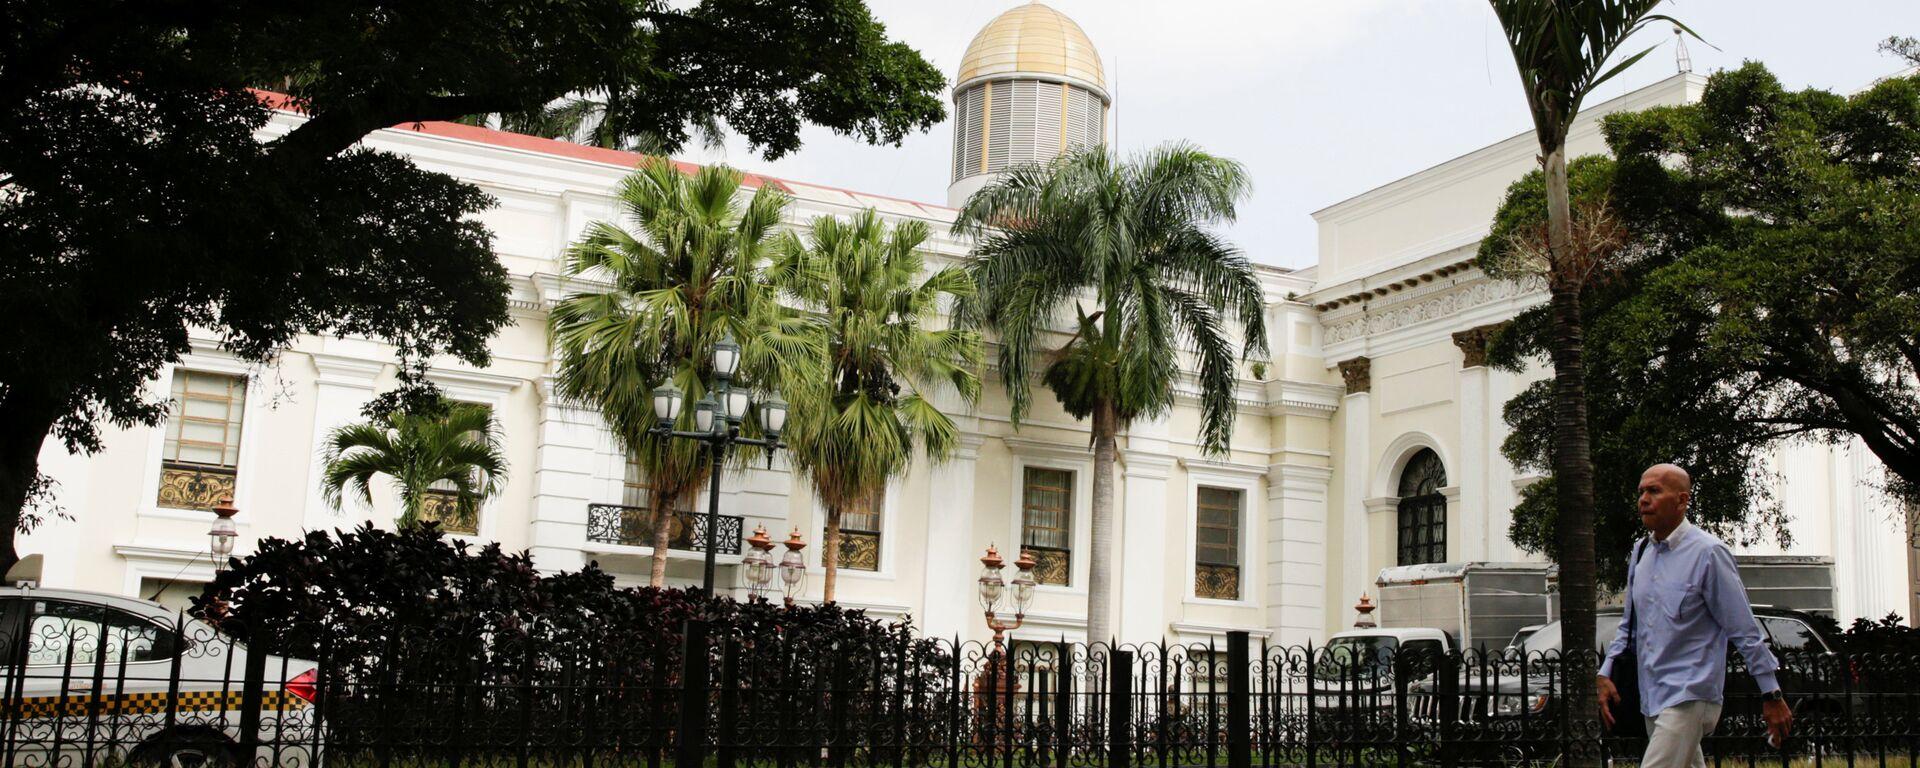 A man walks past the building of the National Assembly in Caracas, Venezuela - Sputnik Mundo, 1920, 14.01.2021